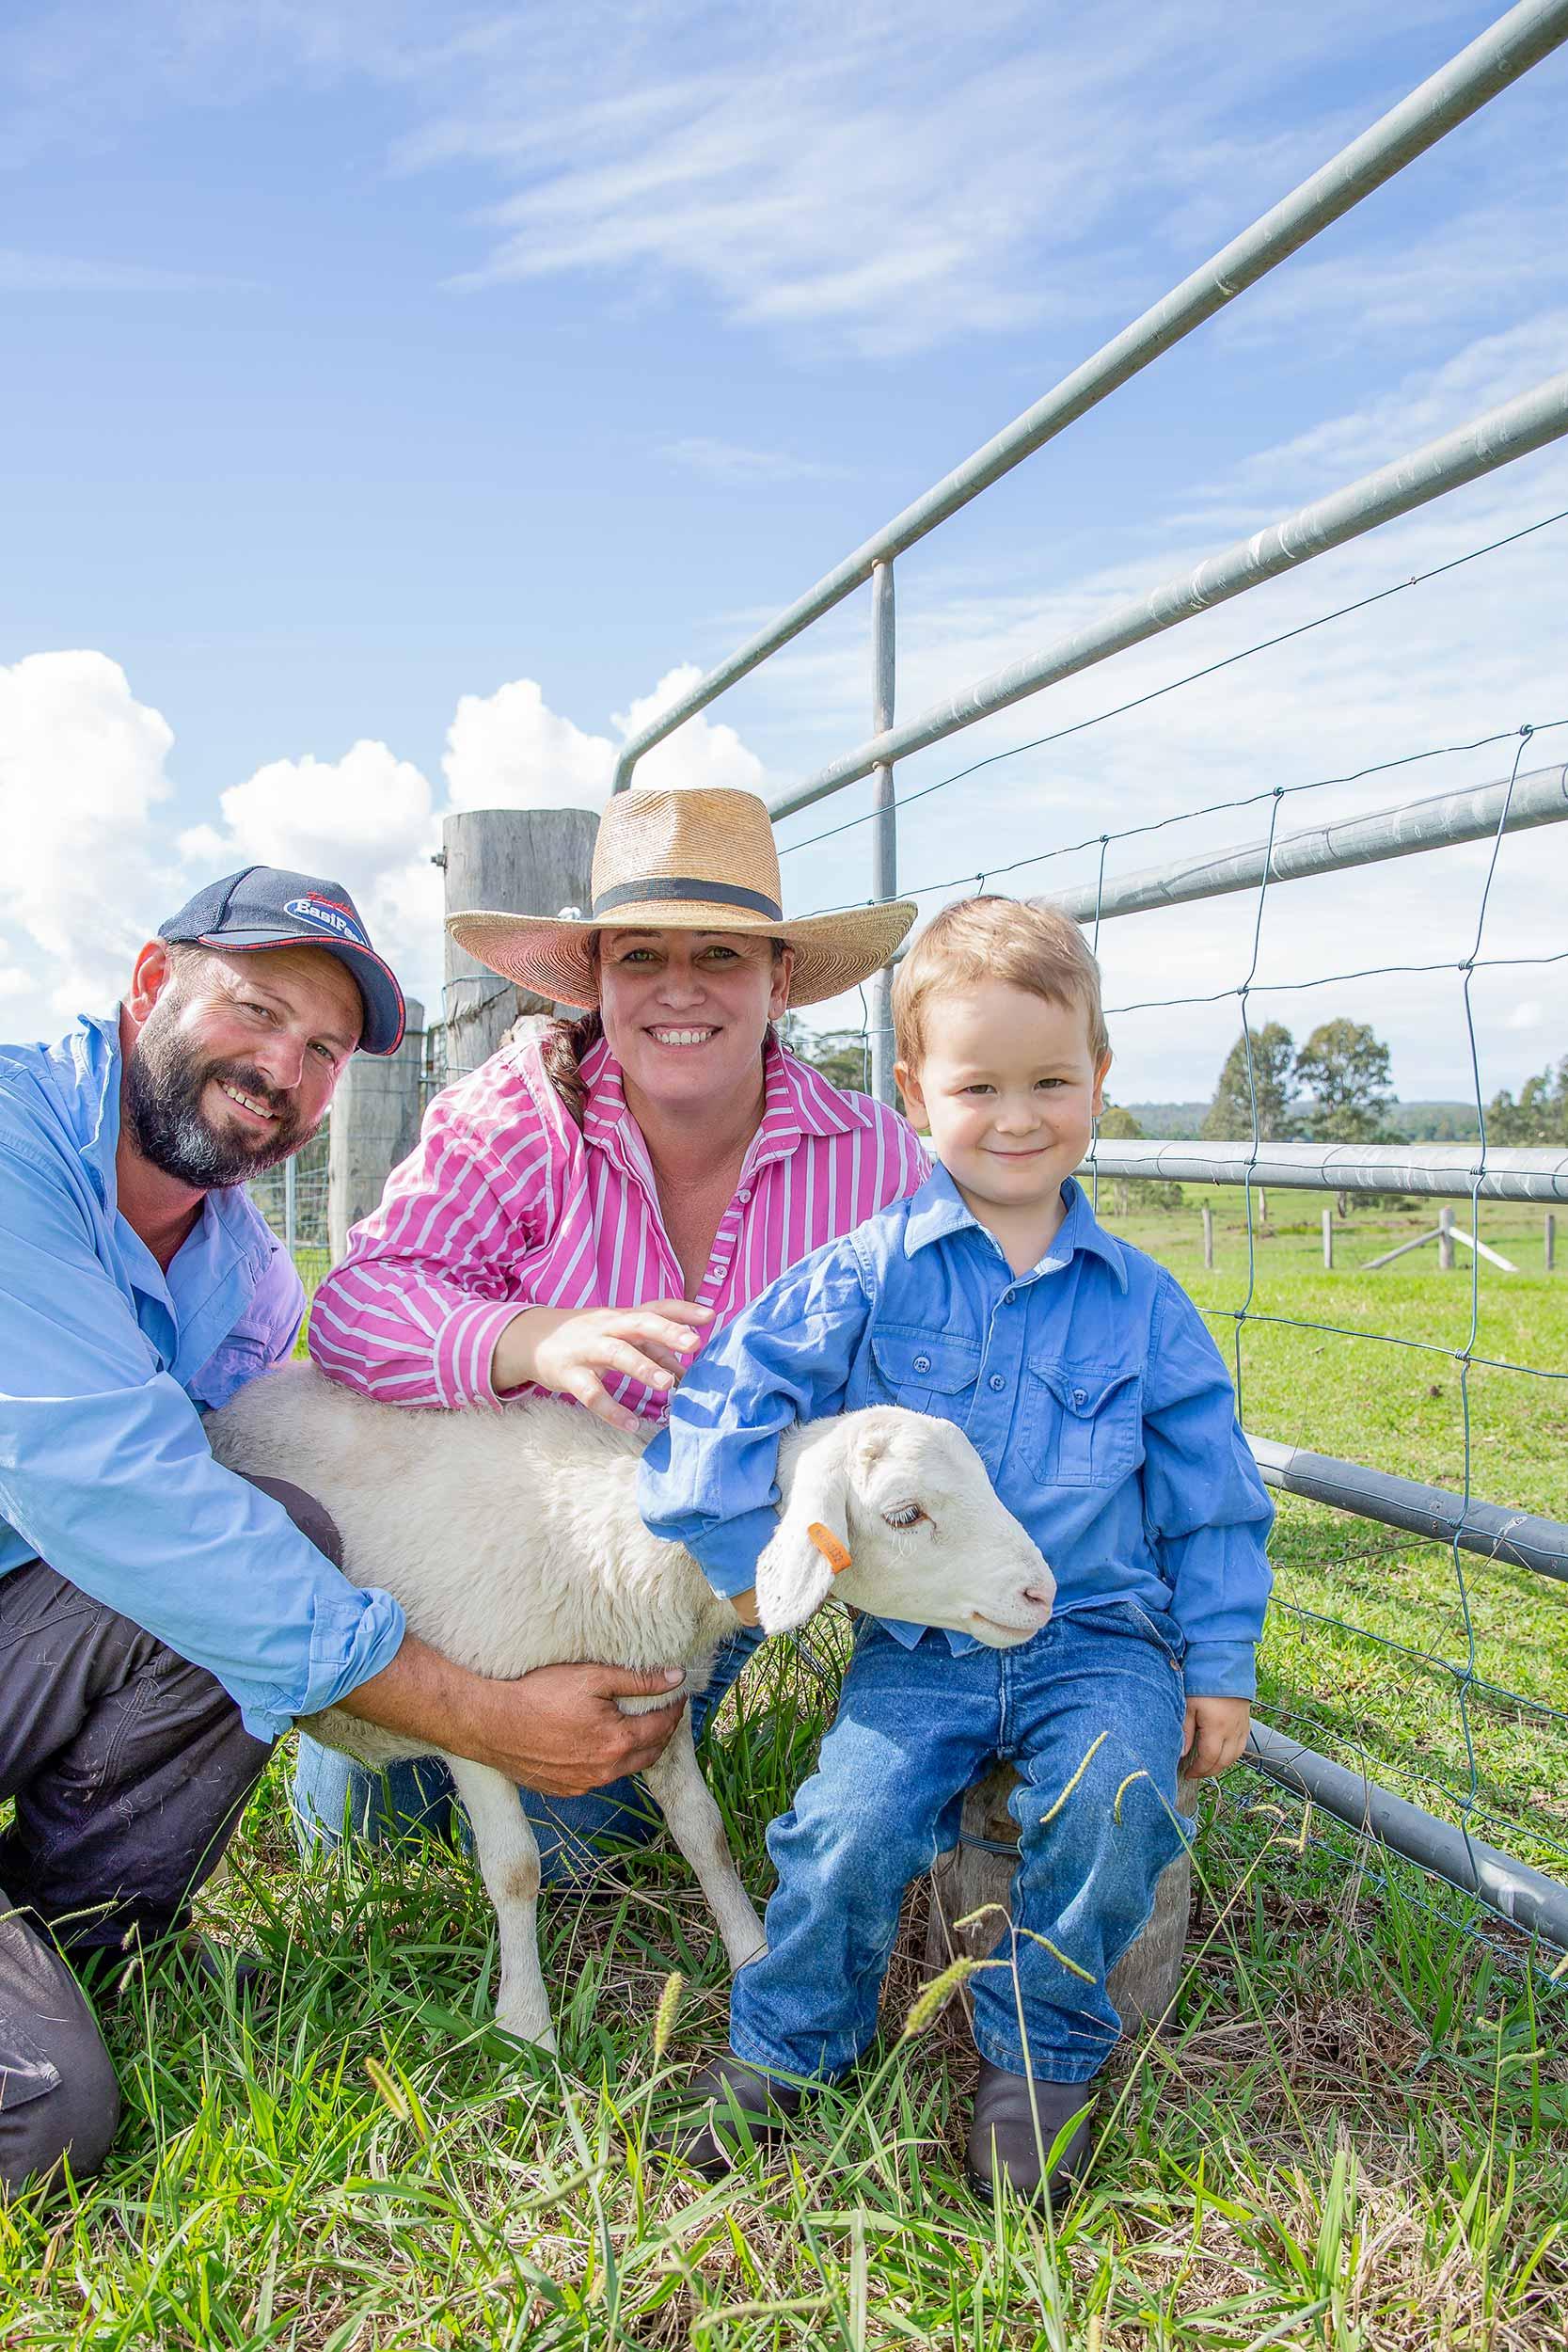 glft-yeo-farm-local-pasture-raised-lamb.jpg